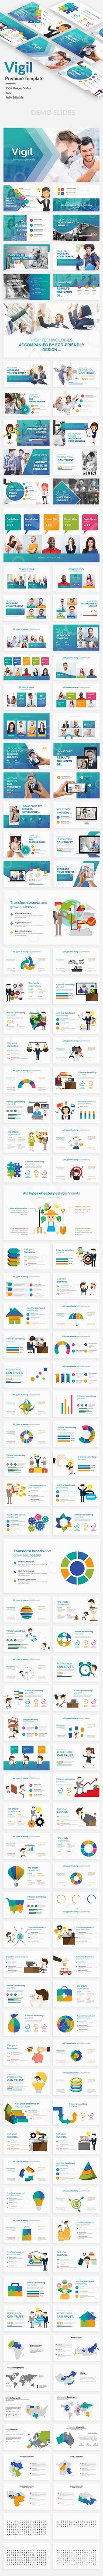 #Vigil Business Premium #Powerpoint Template - Business PowerPoint Templates